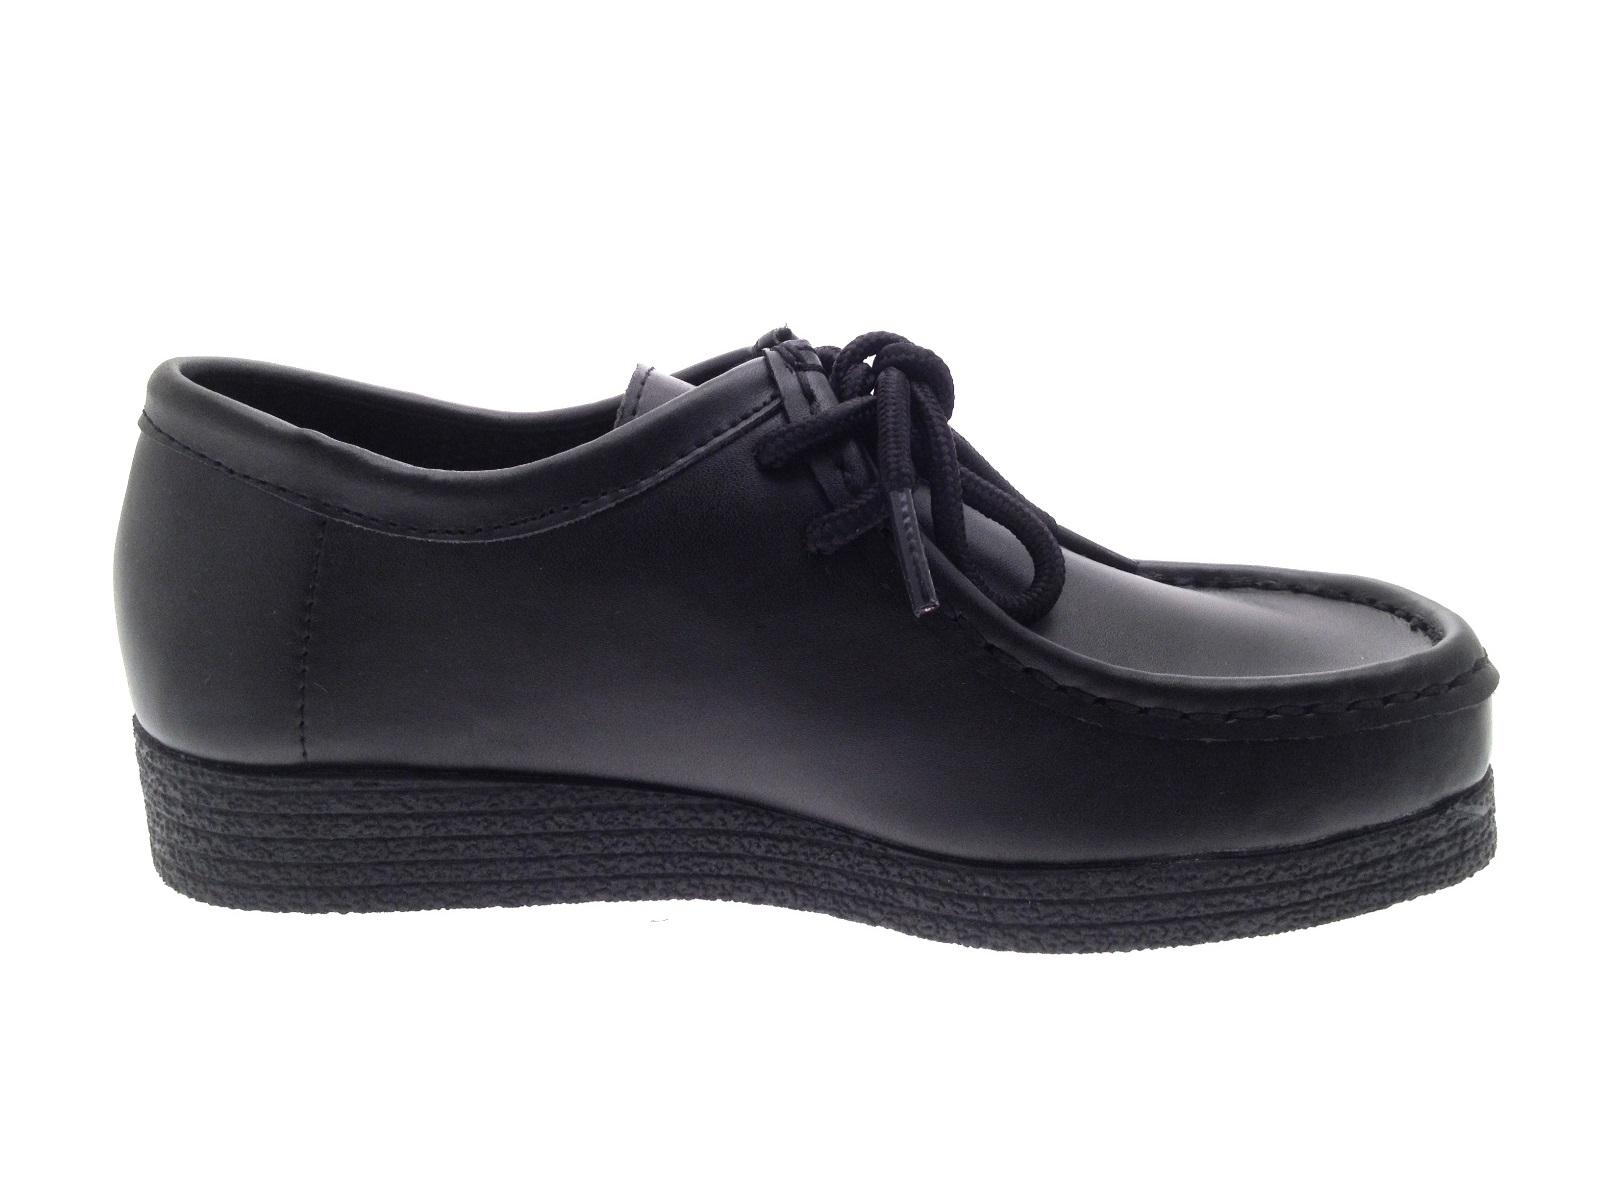 Black Brogue School Shoes